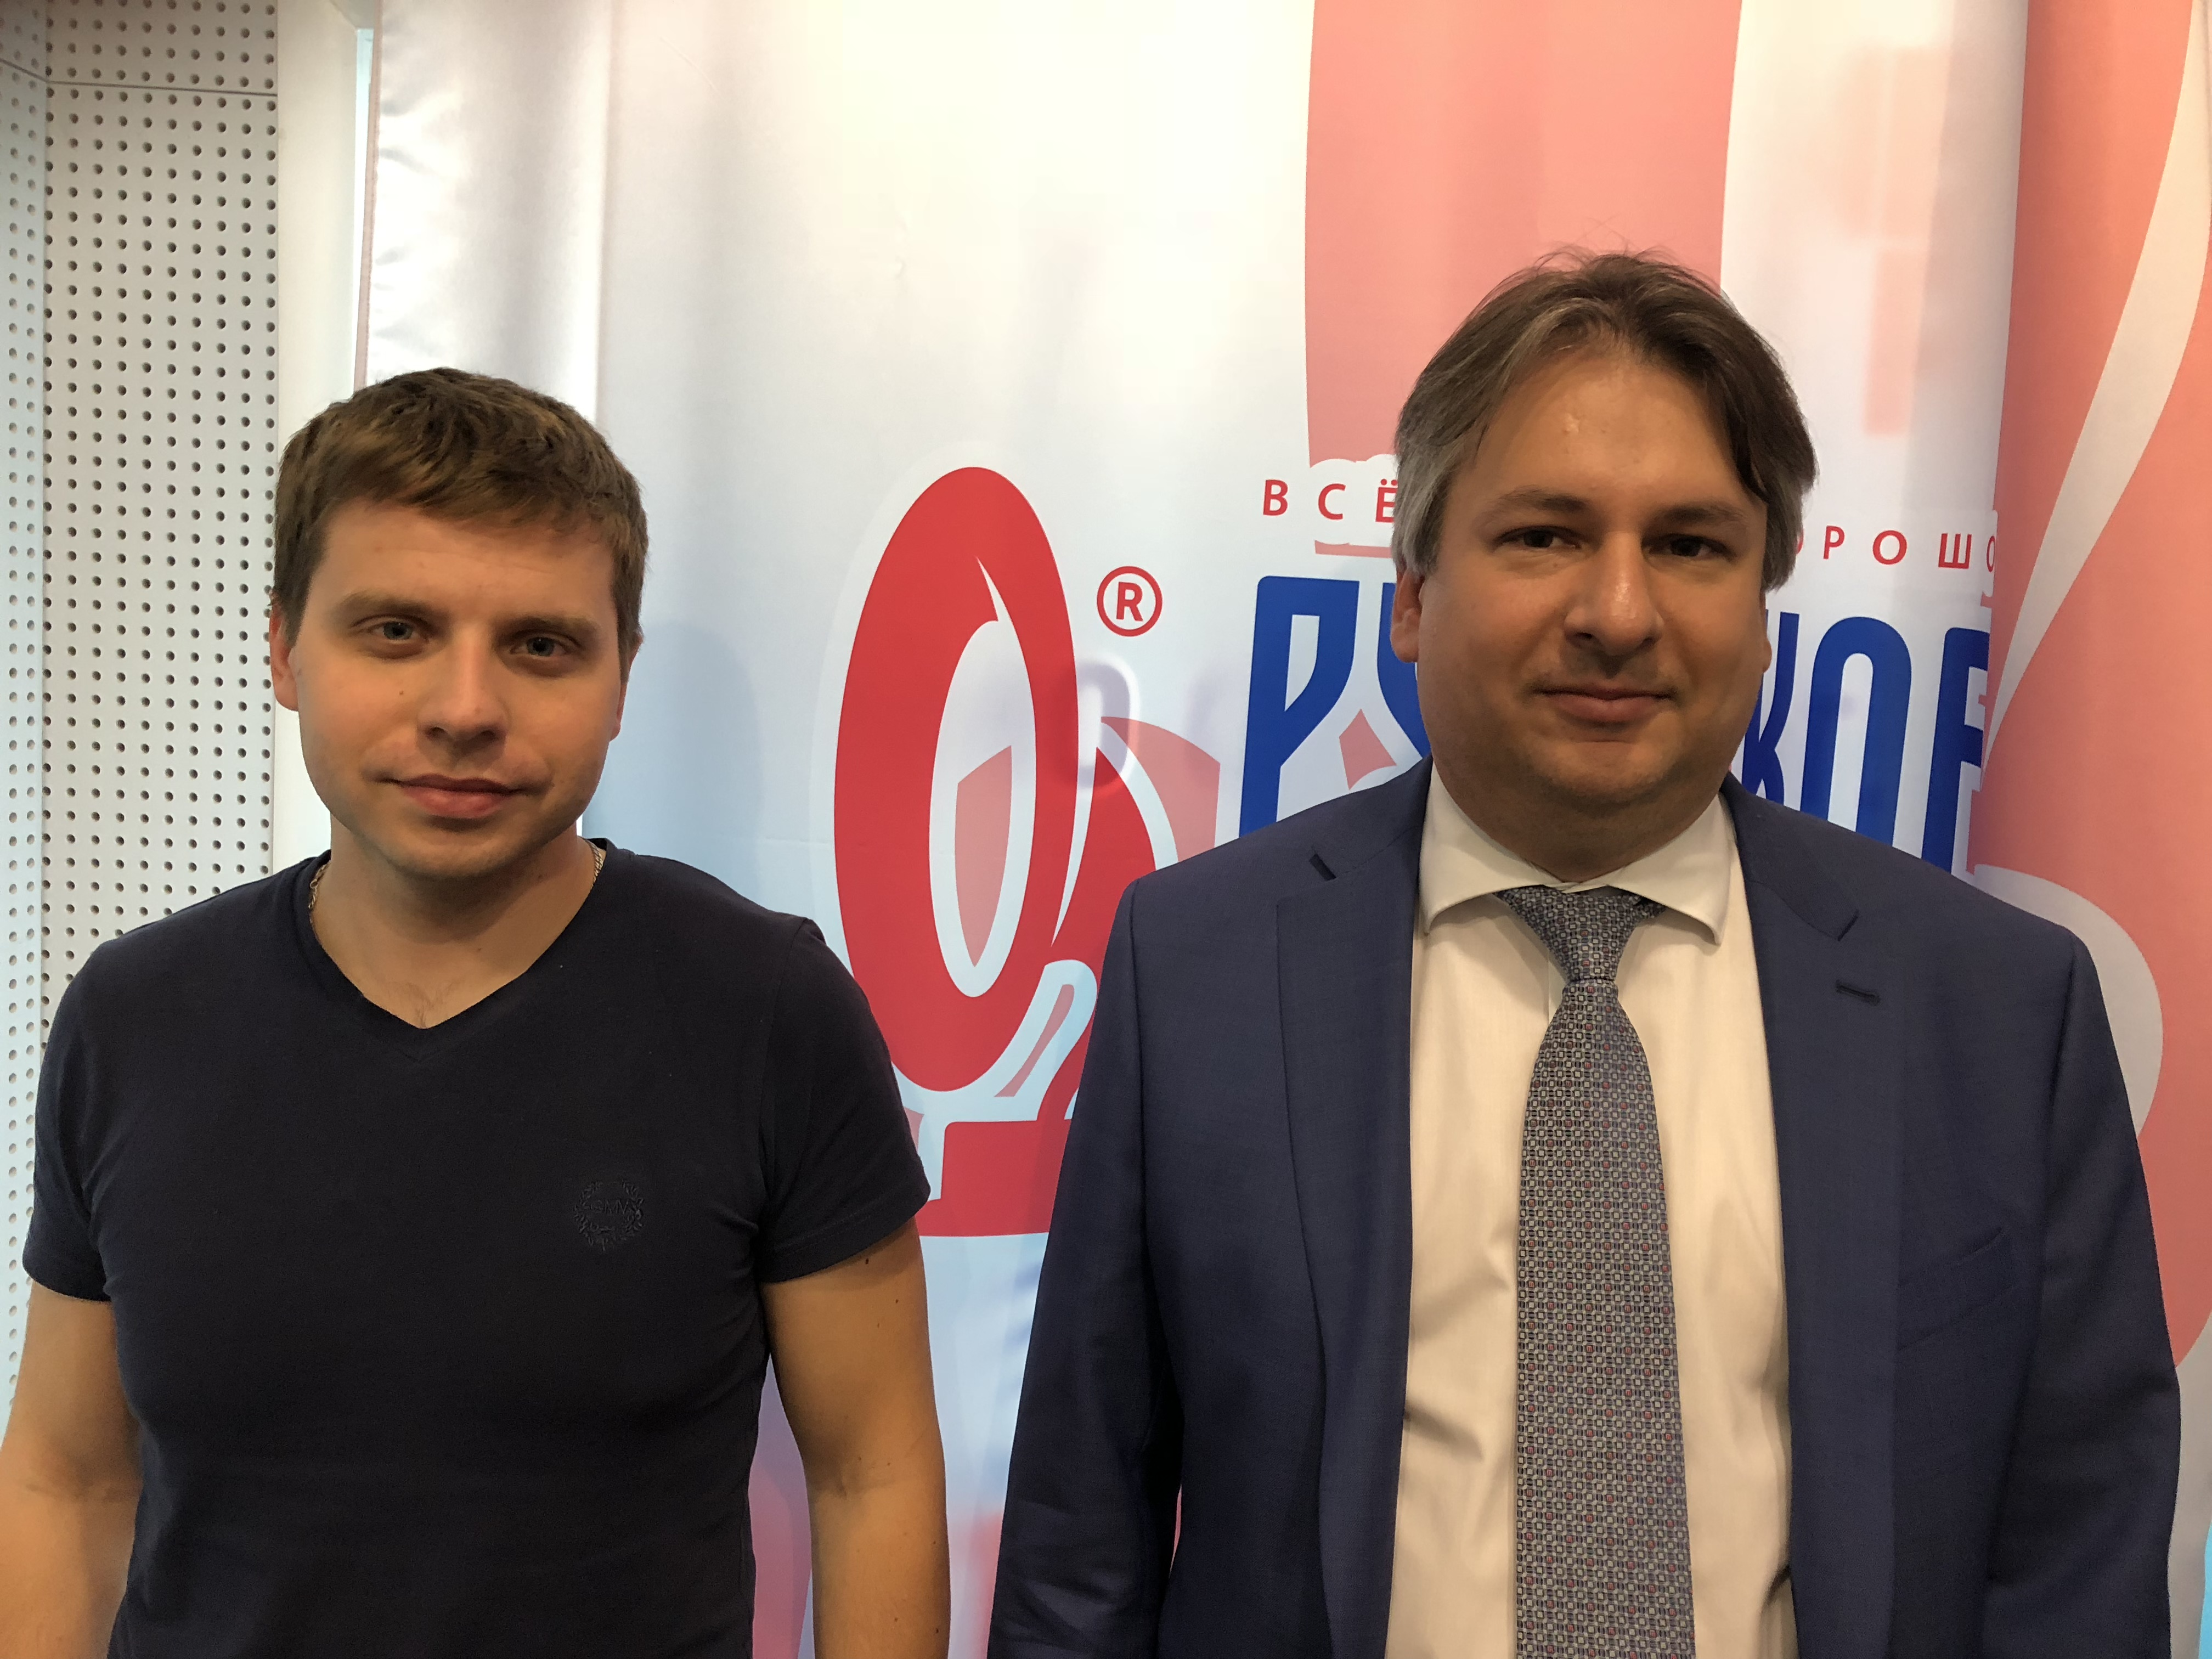 cherkesov-310518-rr